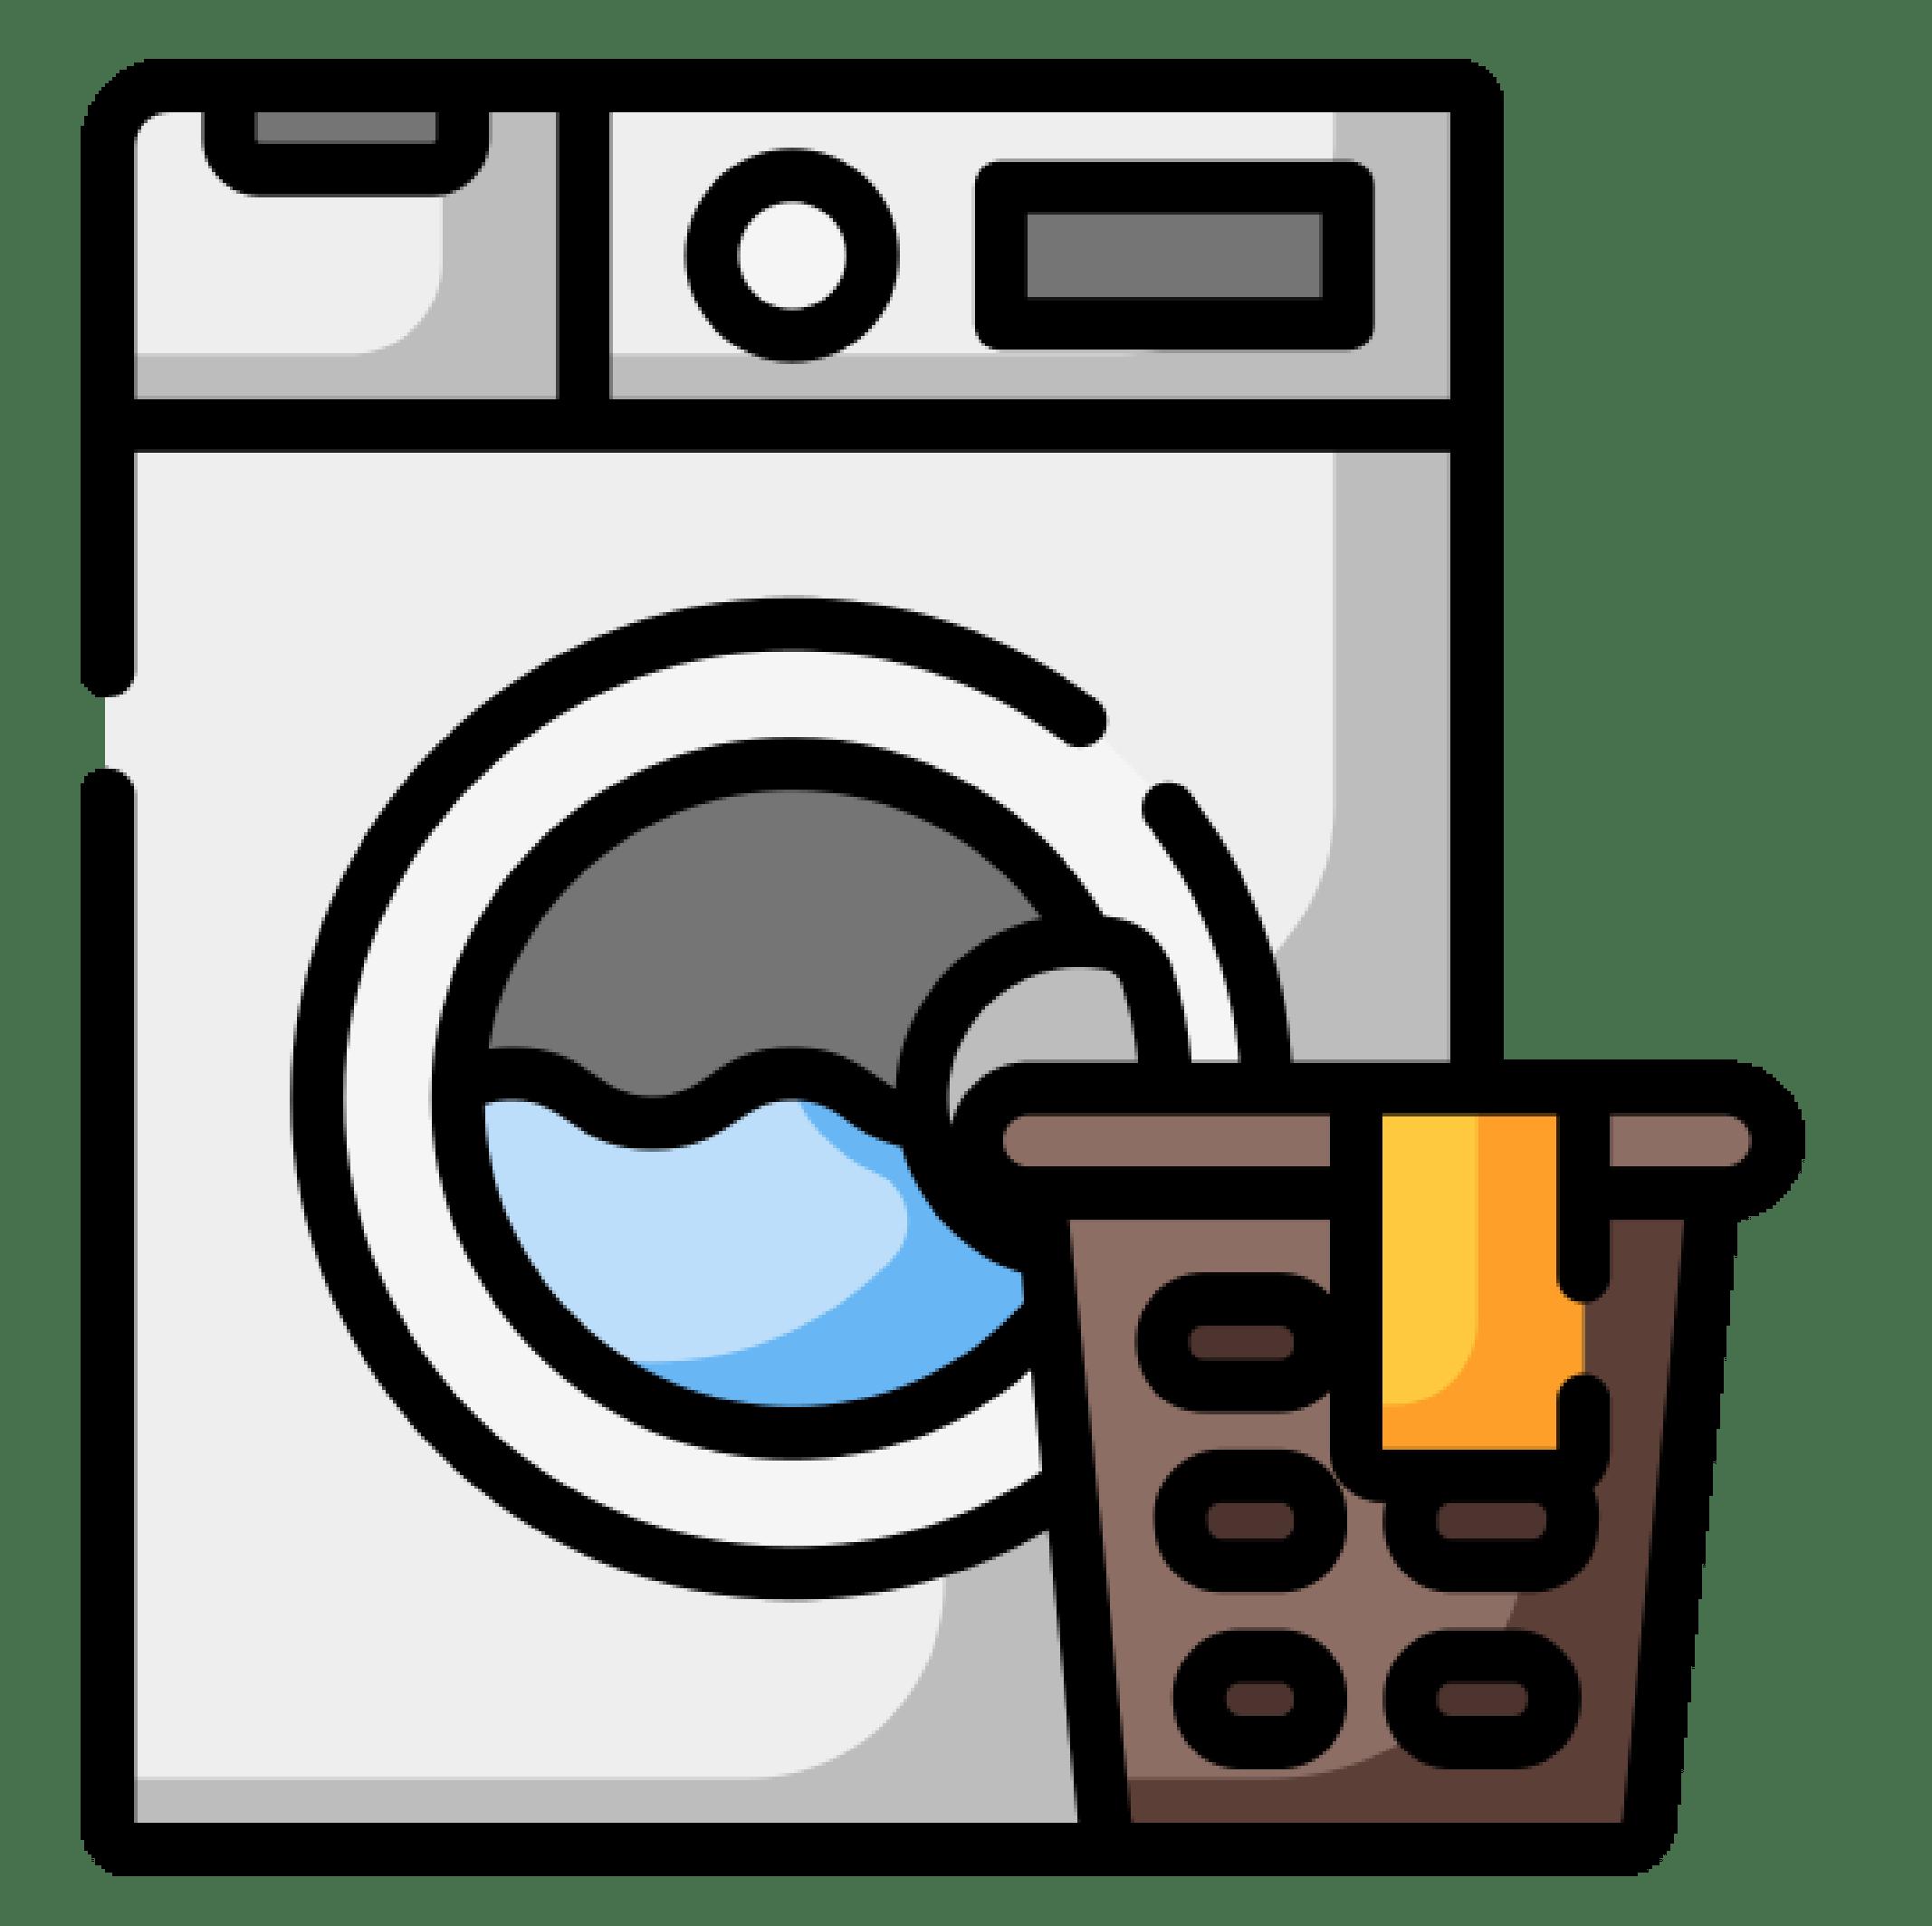 iconos_hostel-10